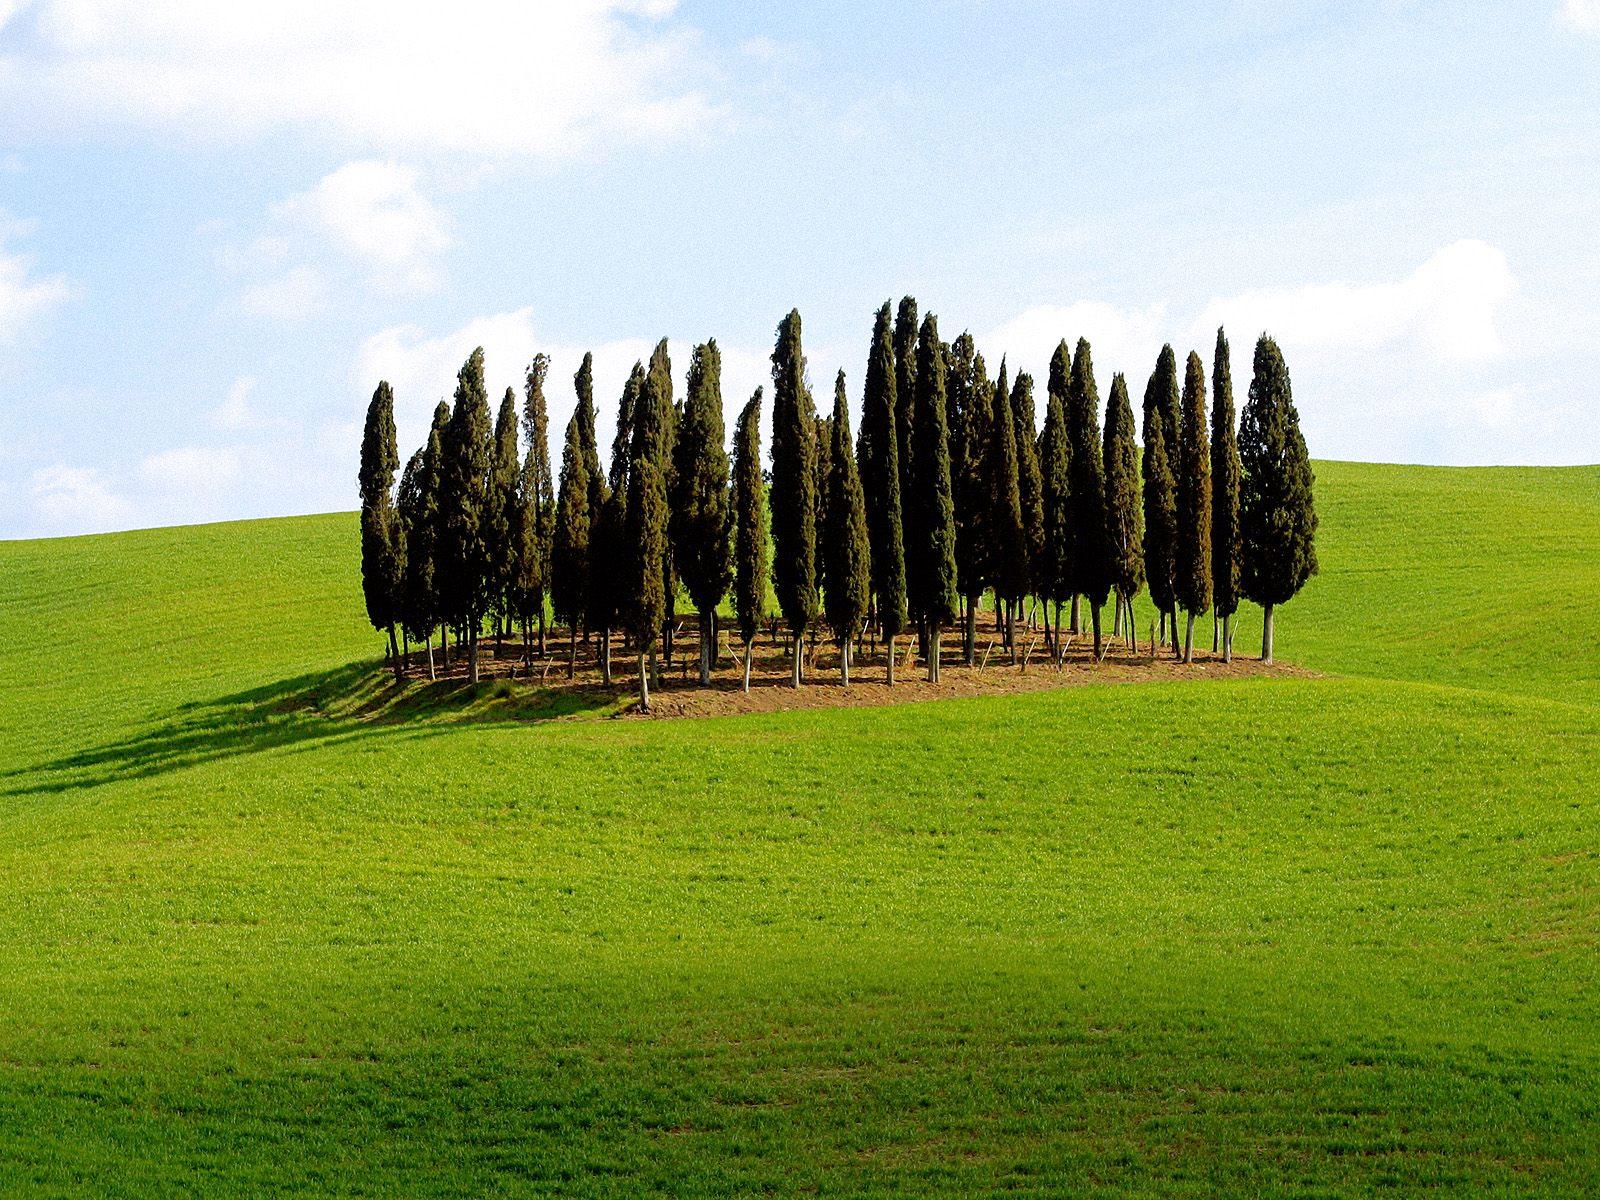 http://2.bp.blogspot.com/-LgGSgqjbhnA/Tcp4hpdh_GI/AAAAAAAACXw/z3EWE0-_S1c/s1600/Scenic+Siena+Province%252C+Tuscany%252C+Italy.jpg